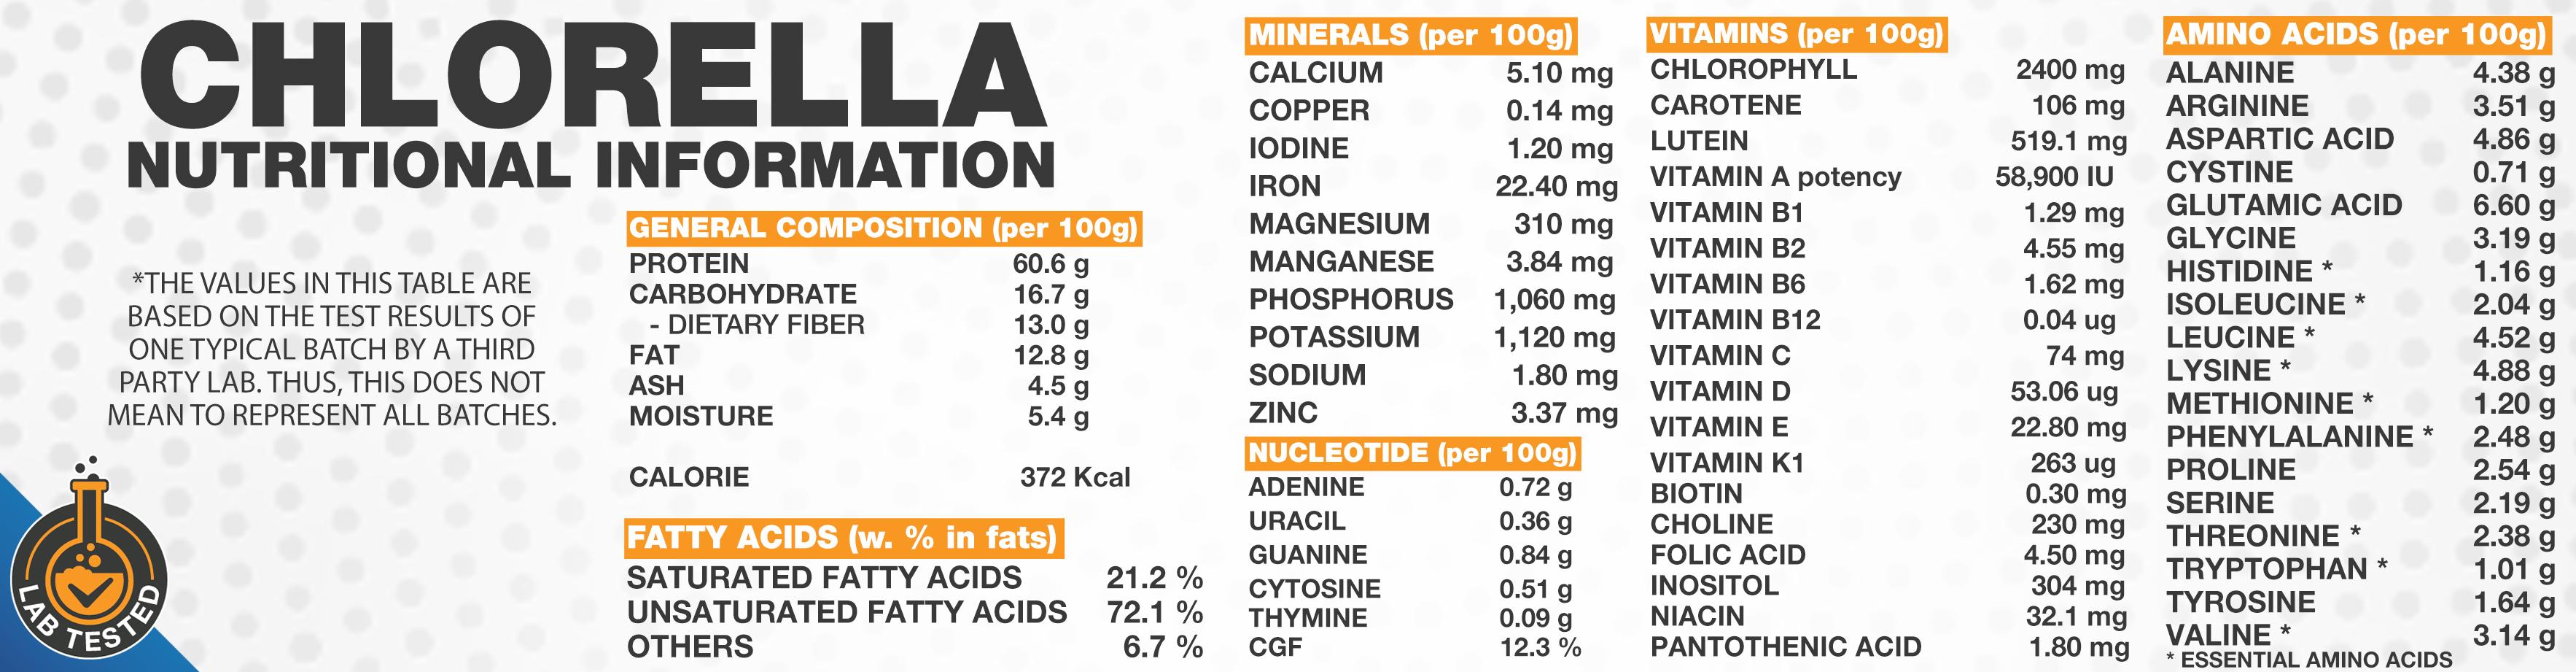 chlorella-nutrition-banner.jpg